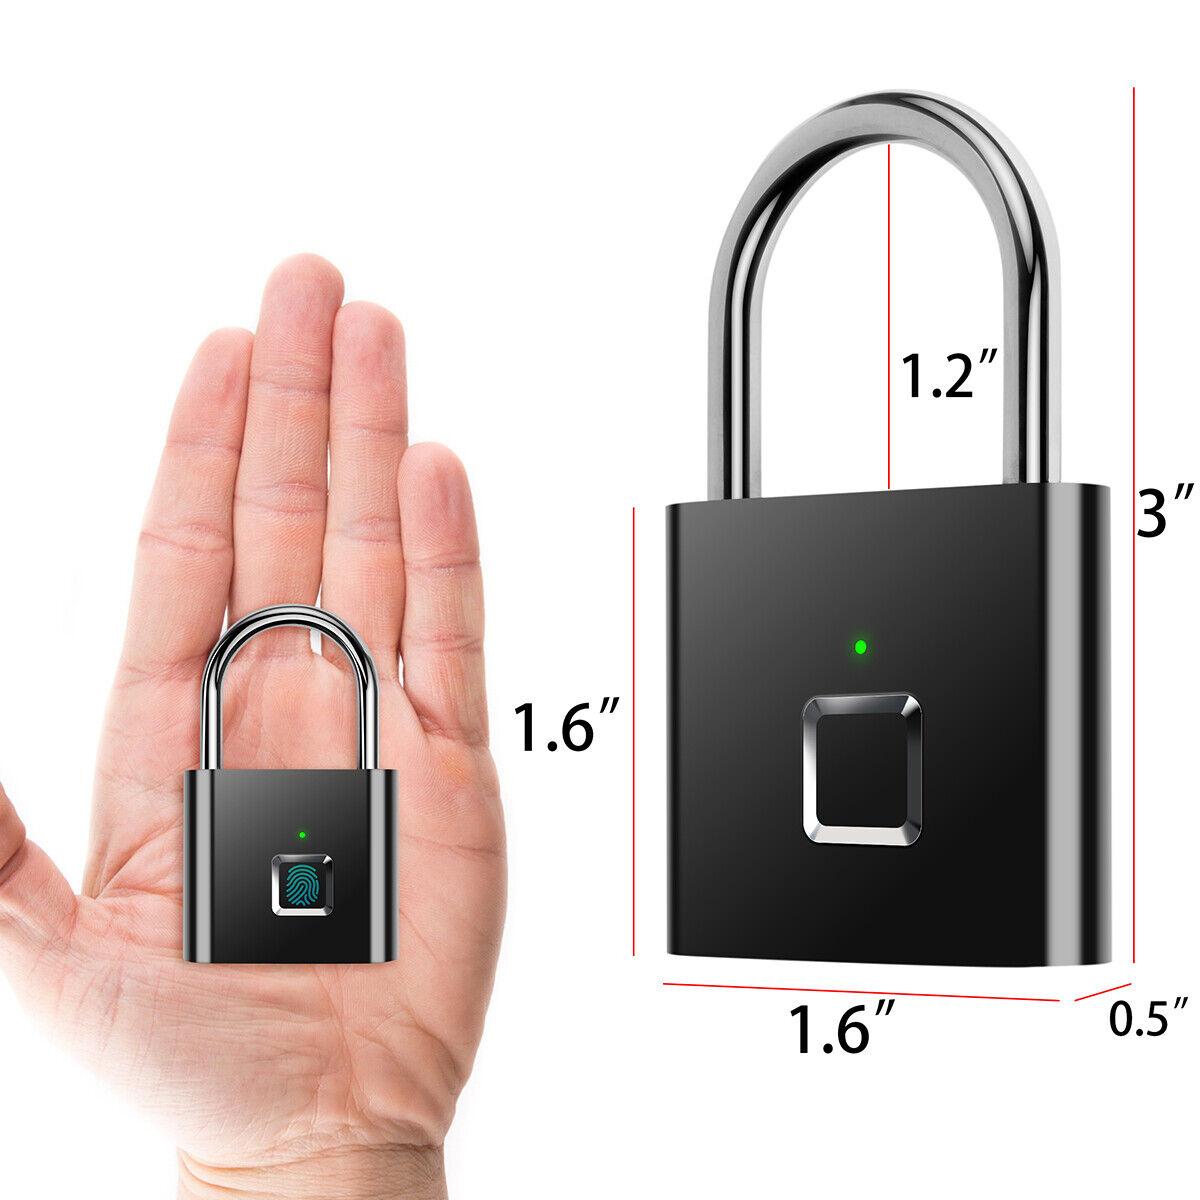 SMART BLUETOOTH ANTI-THEFT KEYLESS SECURITY W/USB